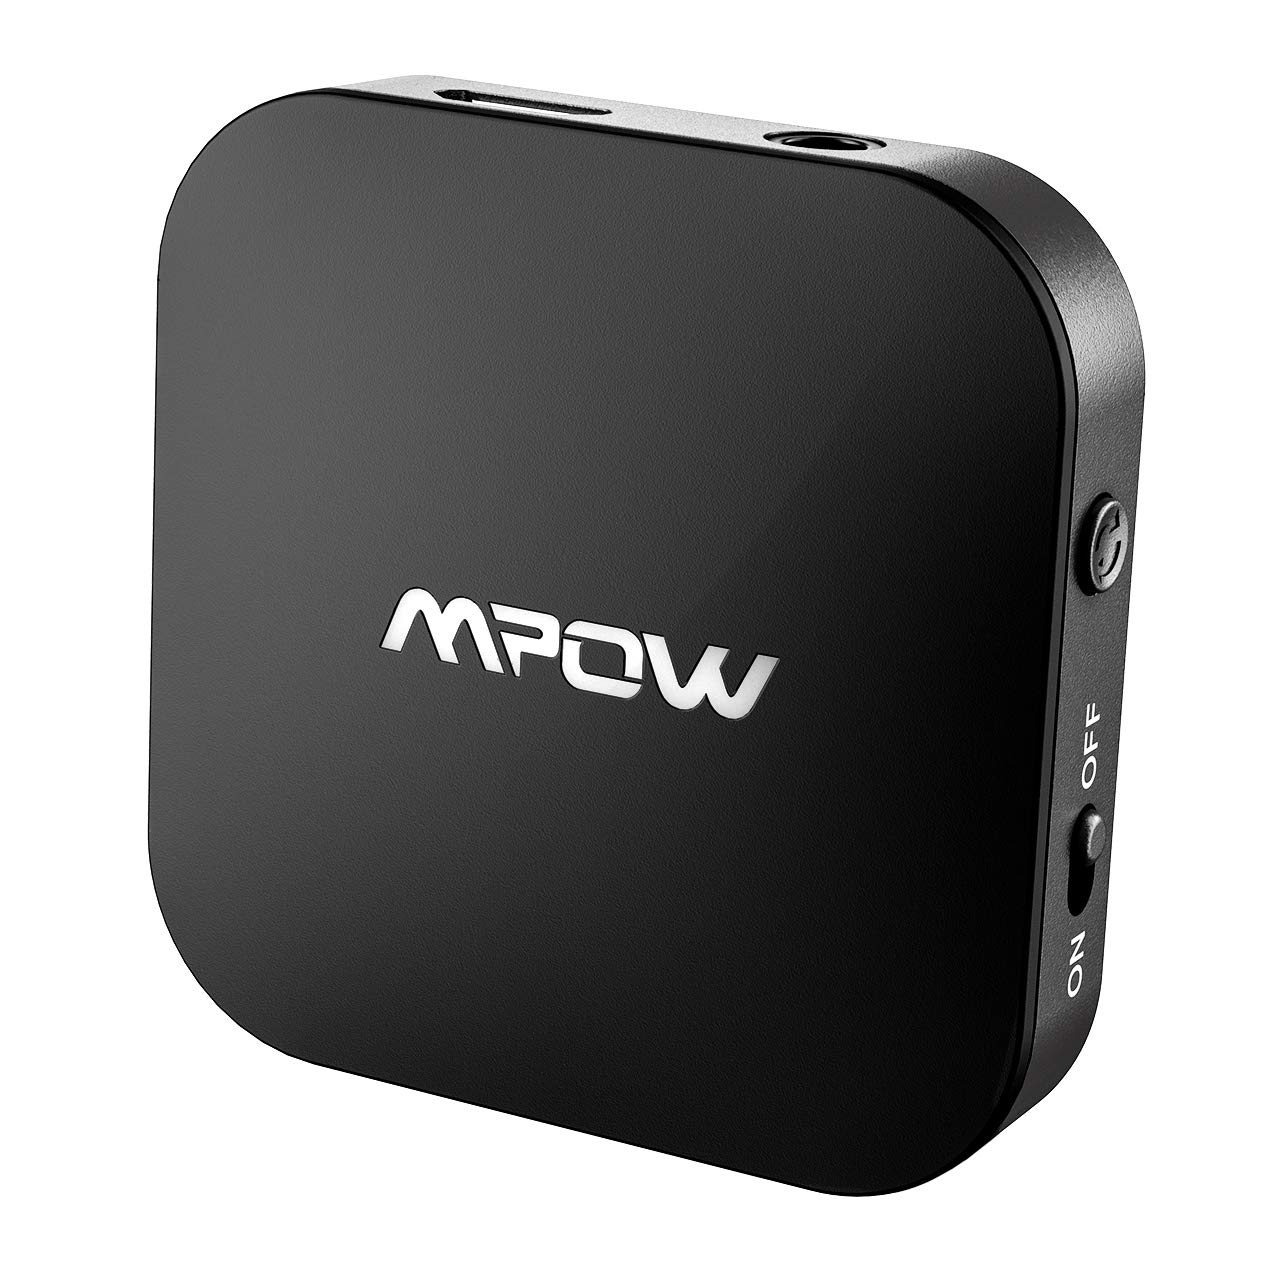 Mpow Bluetooth Transmitter, Bluetooth 5.0 Sender mit aptX Low Latency, kabellos 3.5mm Audio Adapter mit 15m Reichweite, Dual-Link fü r TV, PC, CD-Player